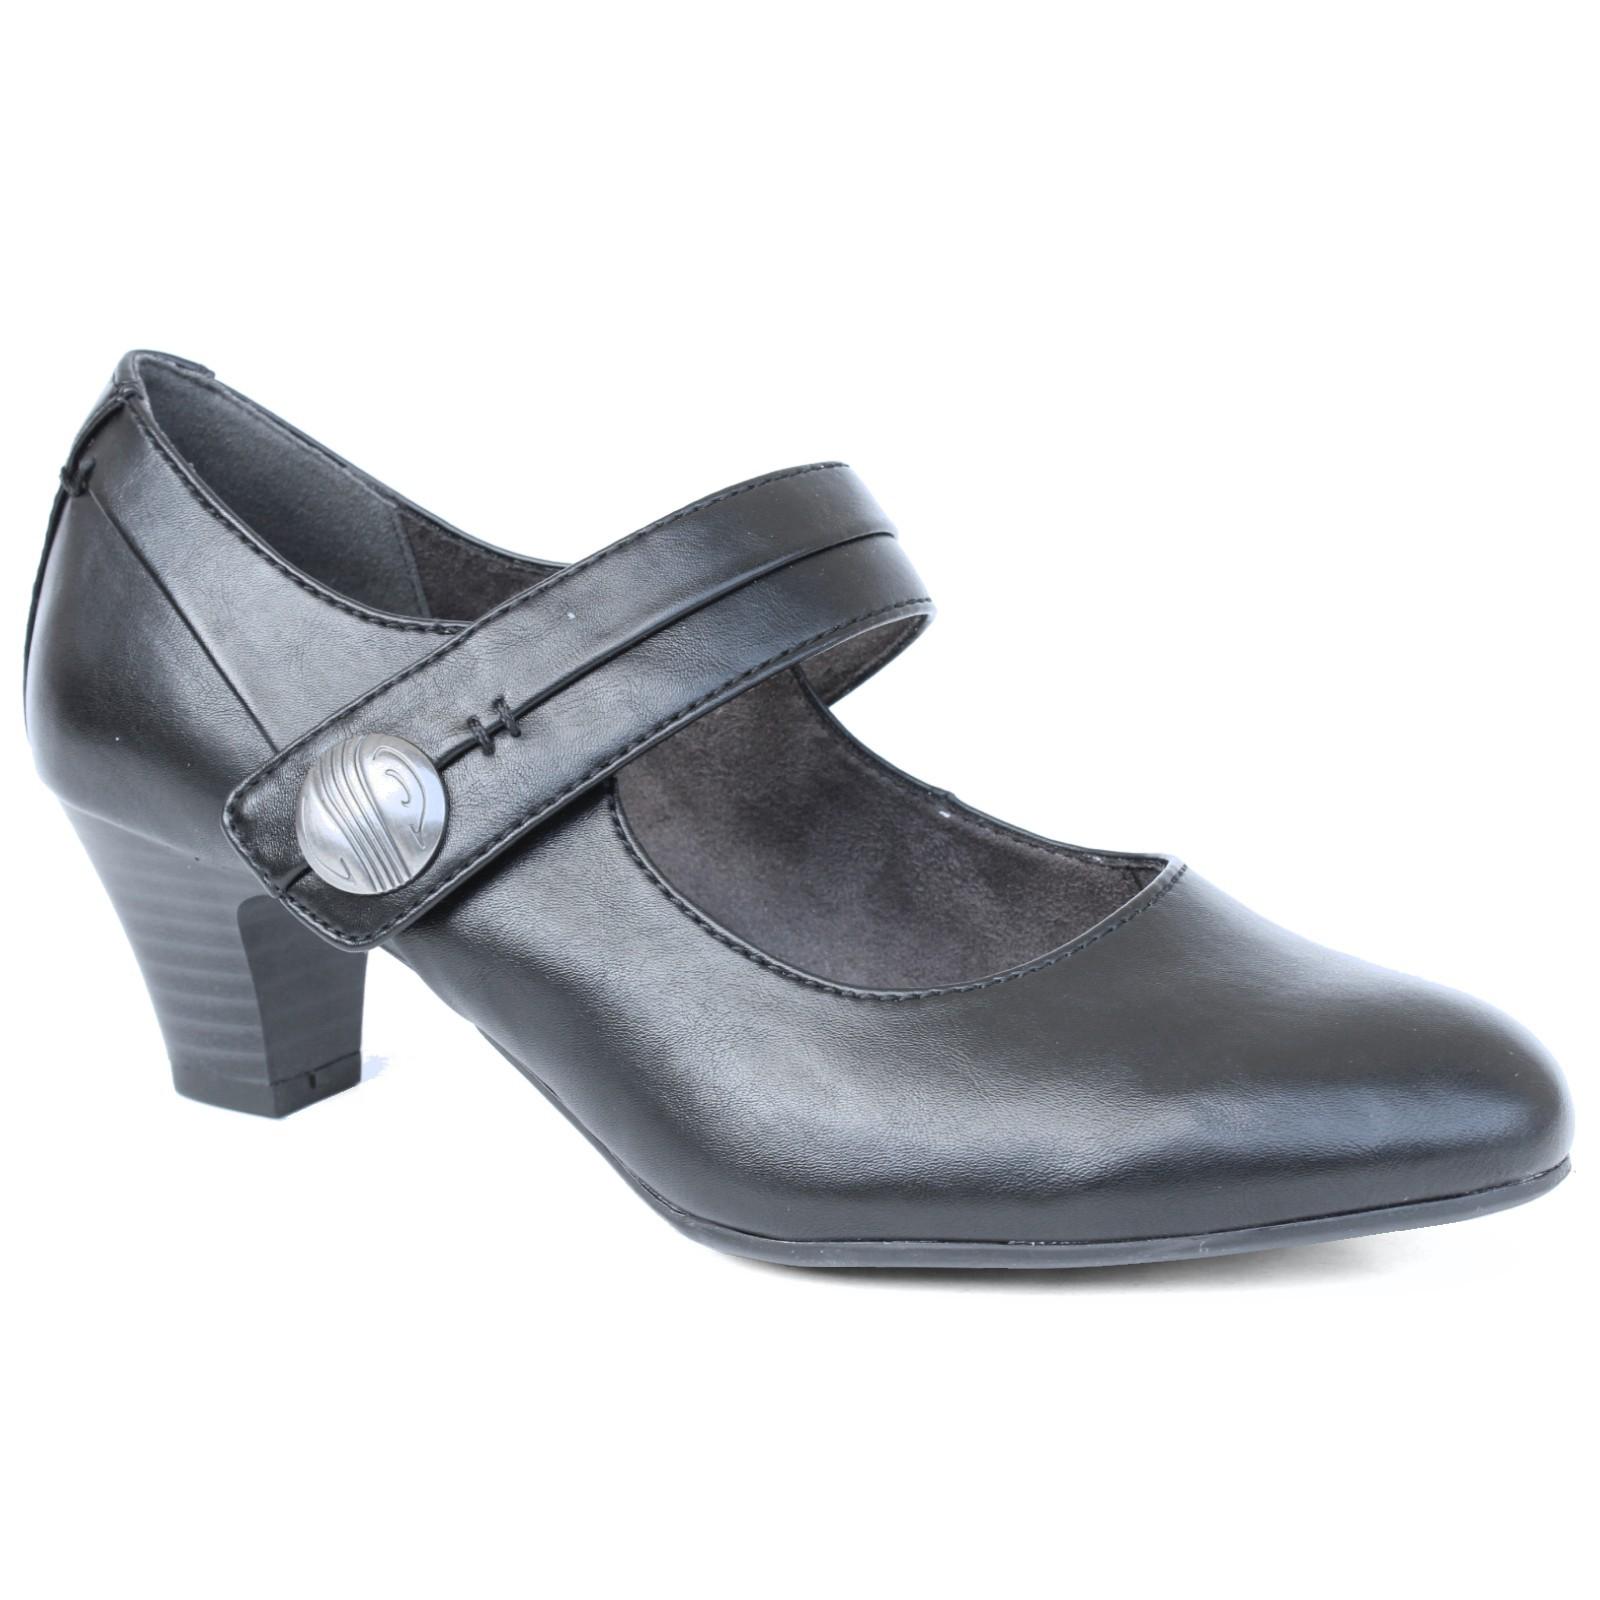 03768 Jana Soft Line női félcipő 24460 27 549 Női pumps